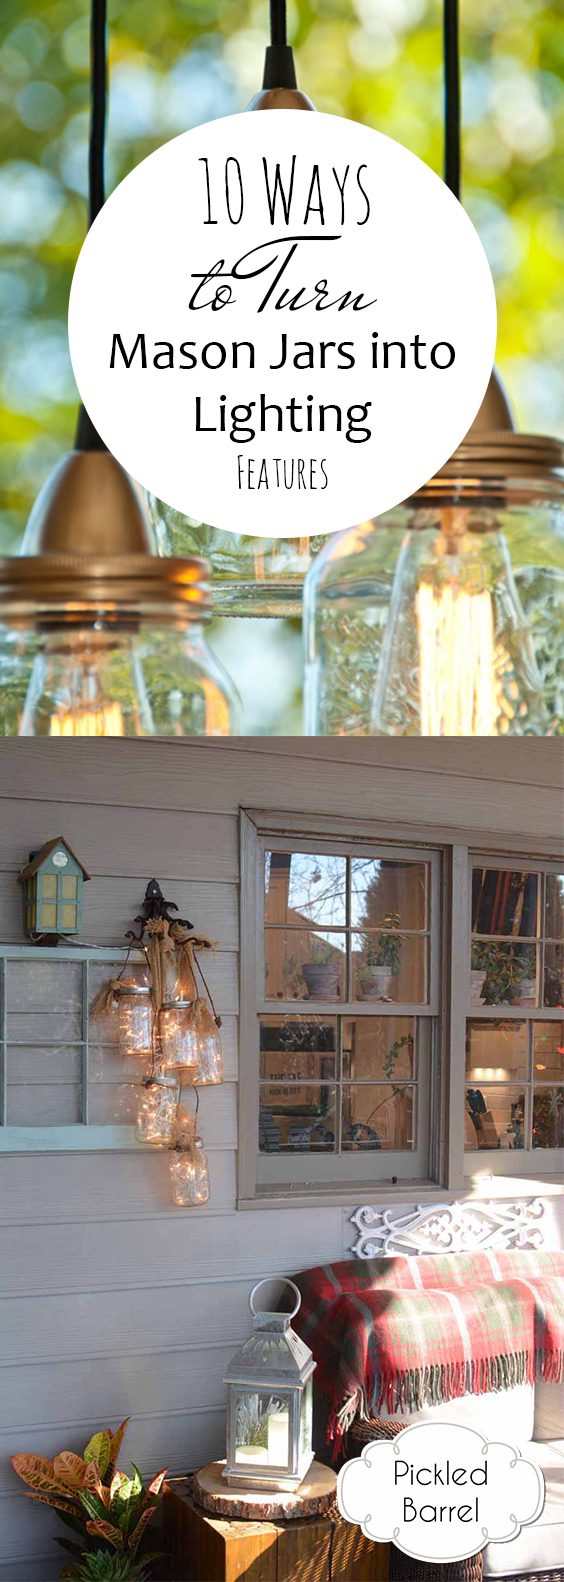 Mason Jar Lighting, Mason Jar Light Fixtures, Mason Jar Lighting DIY, DIY Mason Jar Lighting, Popular Pin, Homemade Lighting, Homemade Lighting Ideas, DIY Lighting for the Home, Popular Pin, Mason Jar DIYs, Mason Jar Crafts.